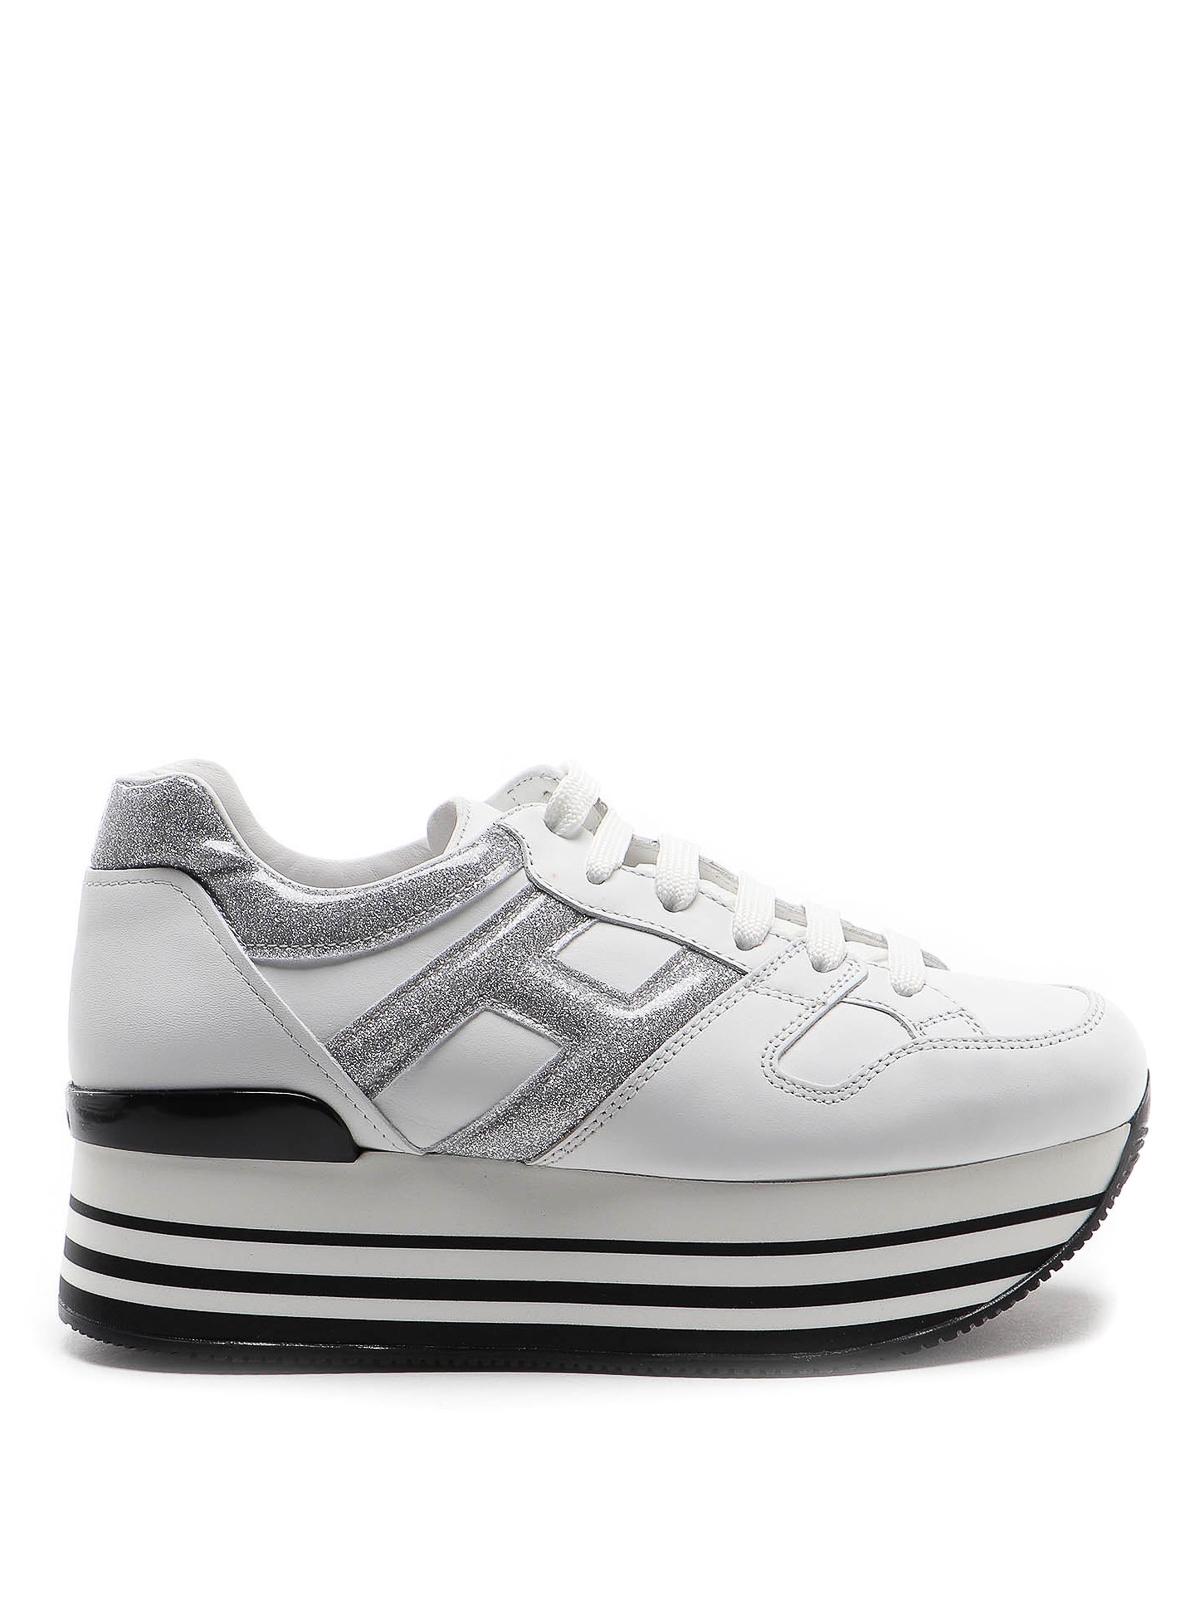 Hogan - Maxi H222 sneakers - trainers - HXW2830T548N1Q0351   iKRIX.com